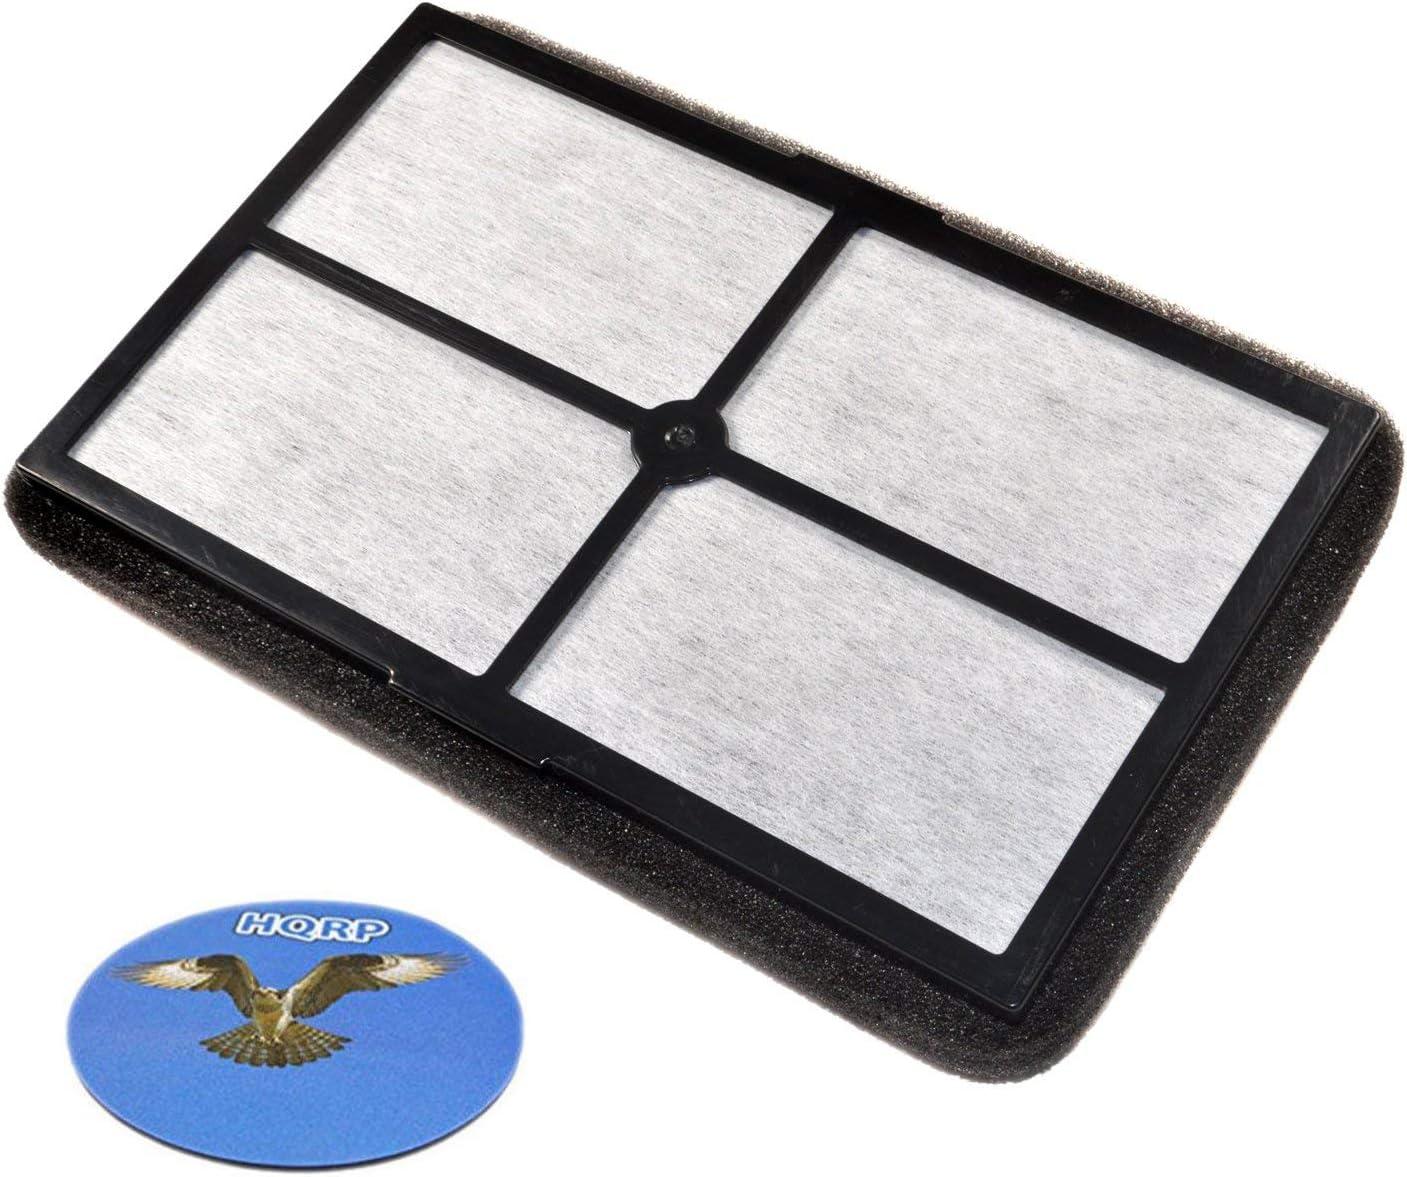 HQRP HEPA Filter works with Black&Decker BXAP040 BXAP041 Table Top models, BXFLTX FLT4010 Replacement plus HQRP Coaster